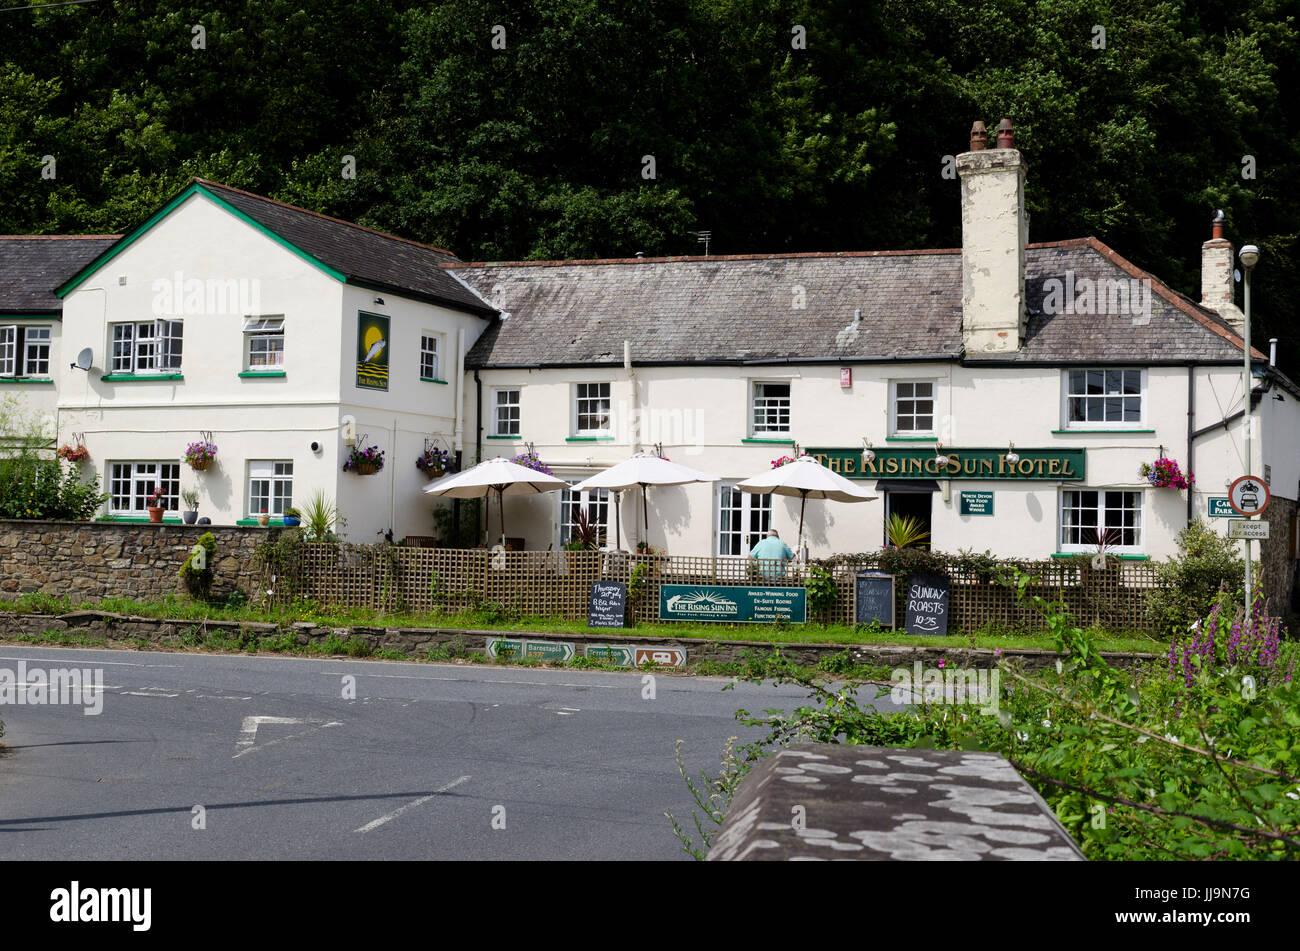 Umberleigh Devon. The Rising Sun Hotel pub. - Stock Image